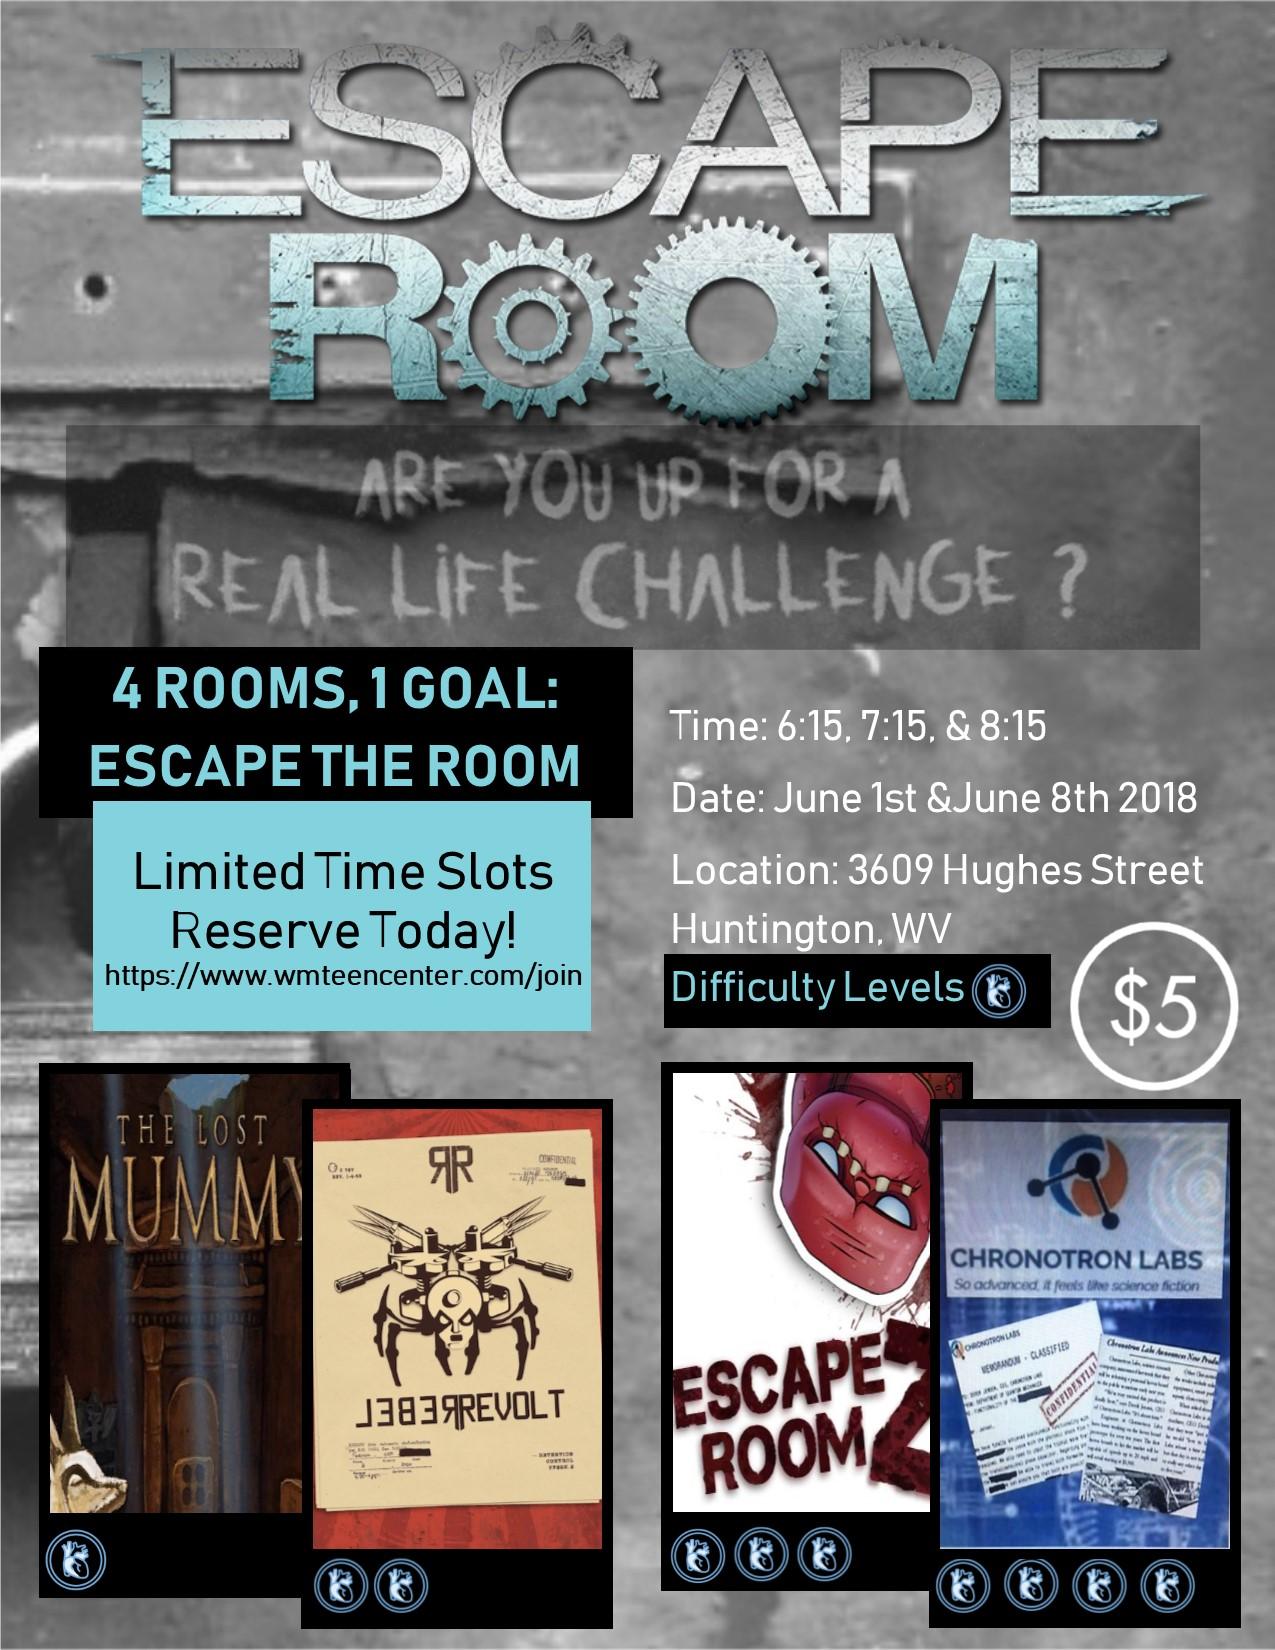 Escape Room Westmoreland Mall